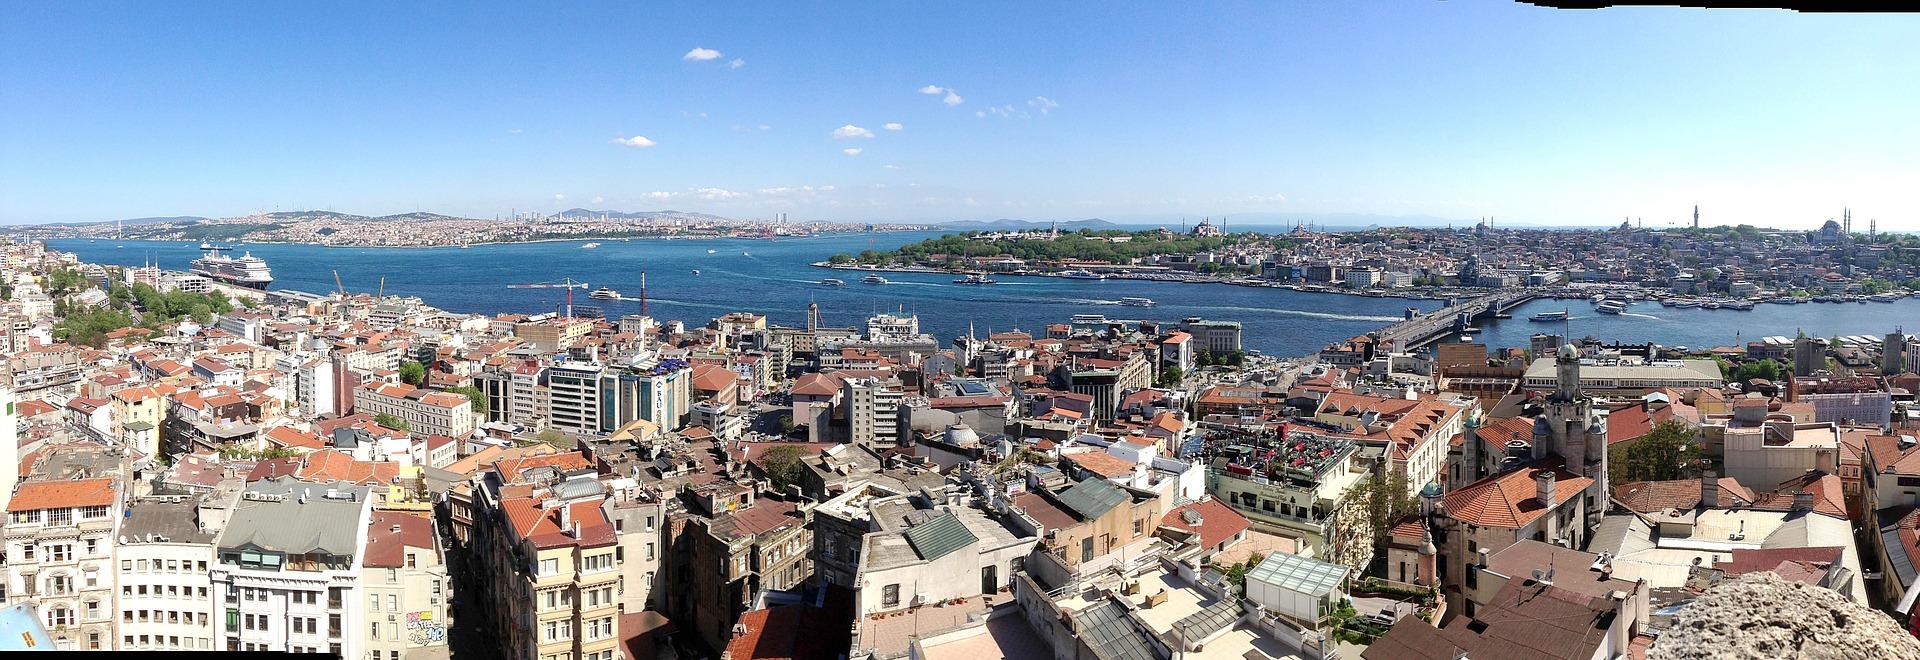 The Bosphorus in Istanbul, Turkey